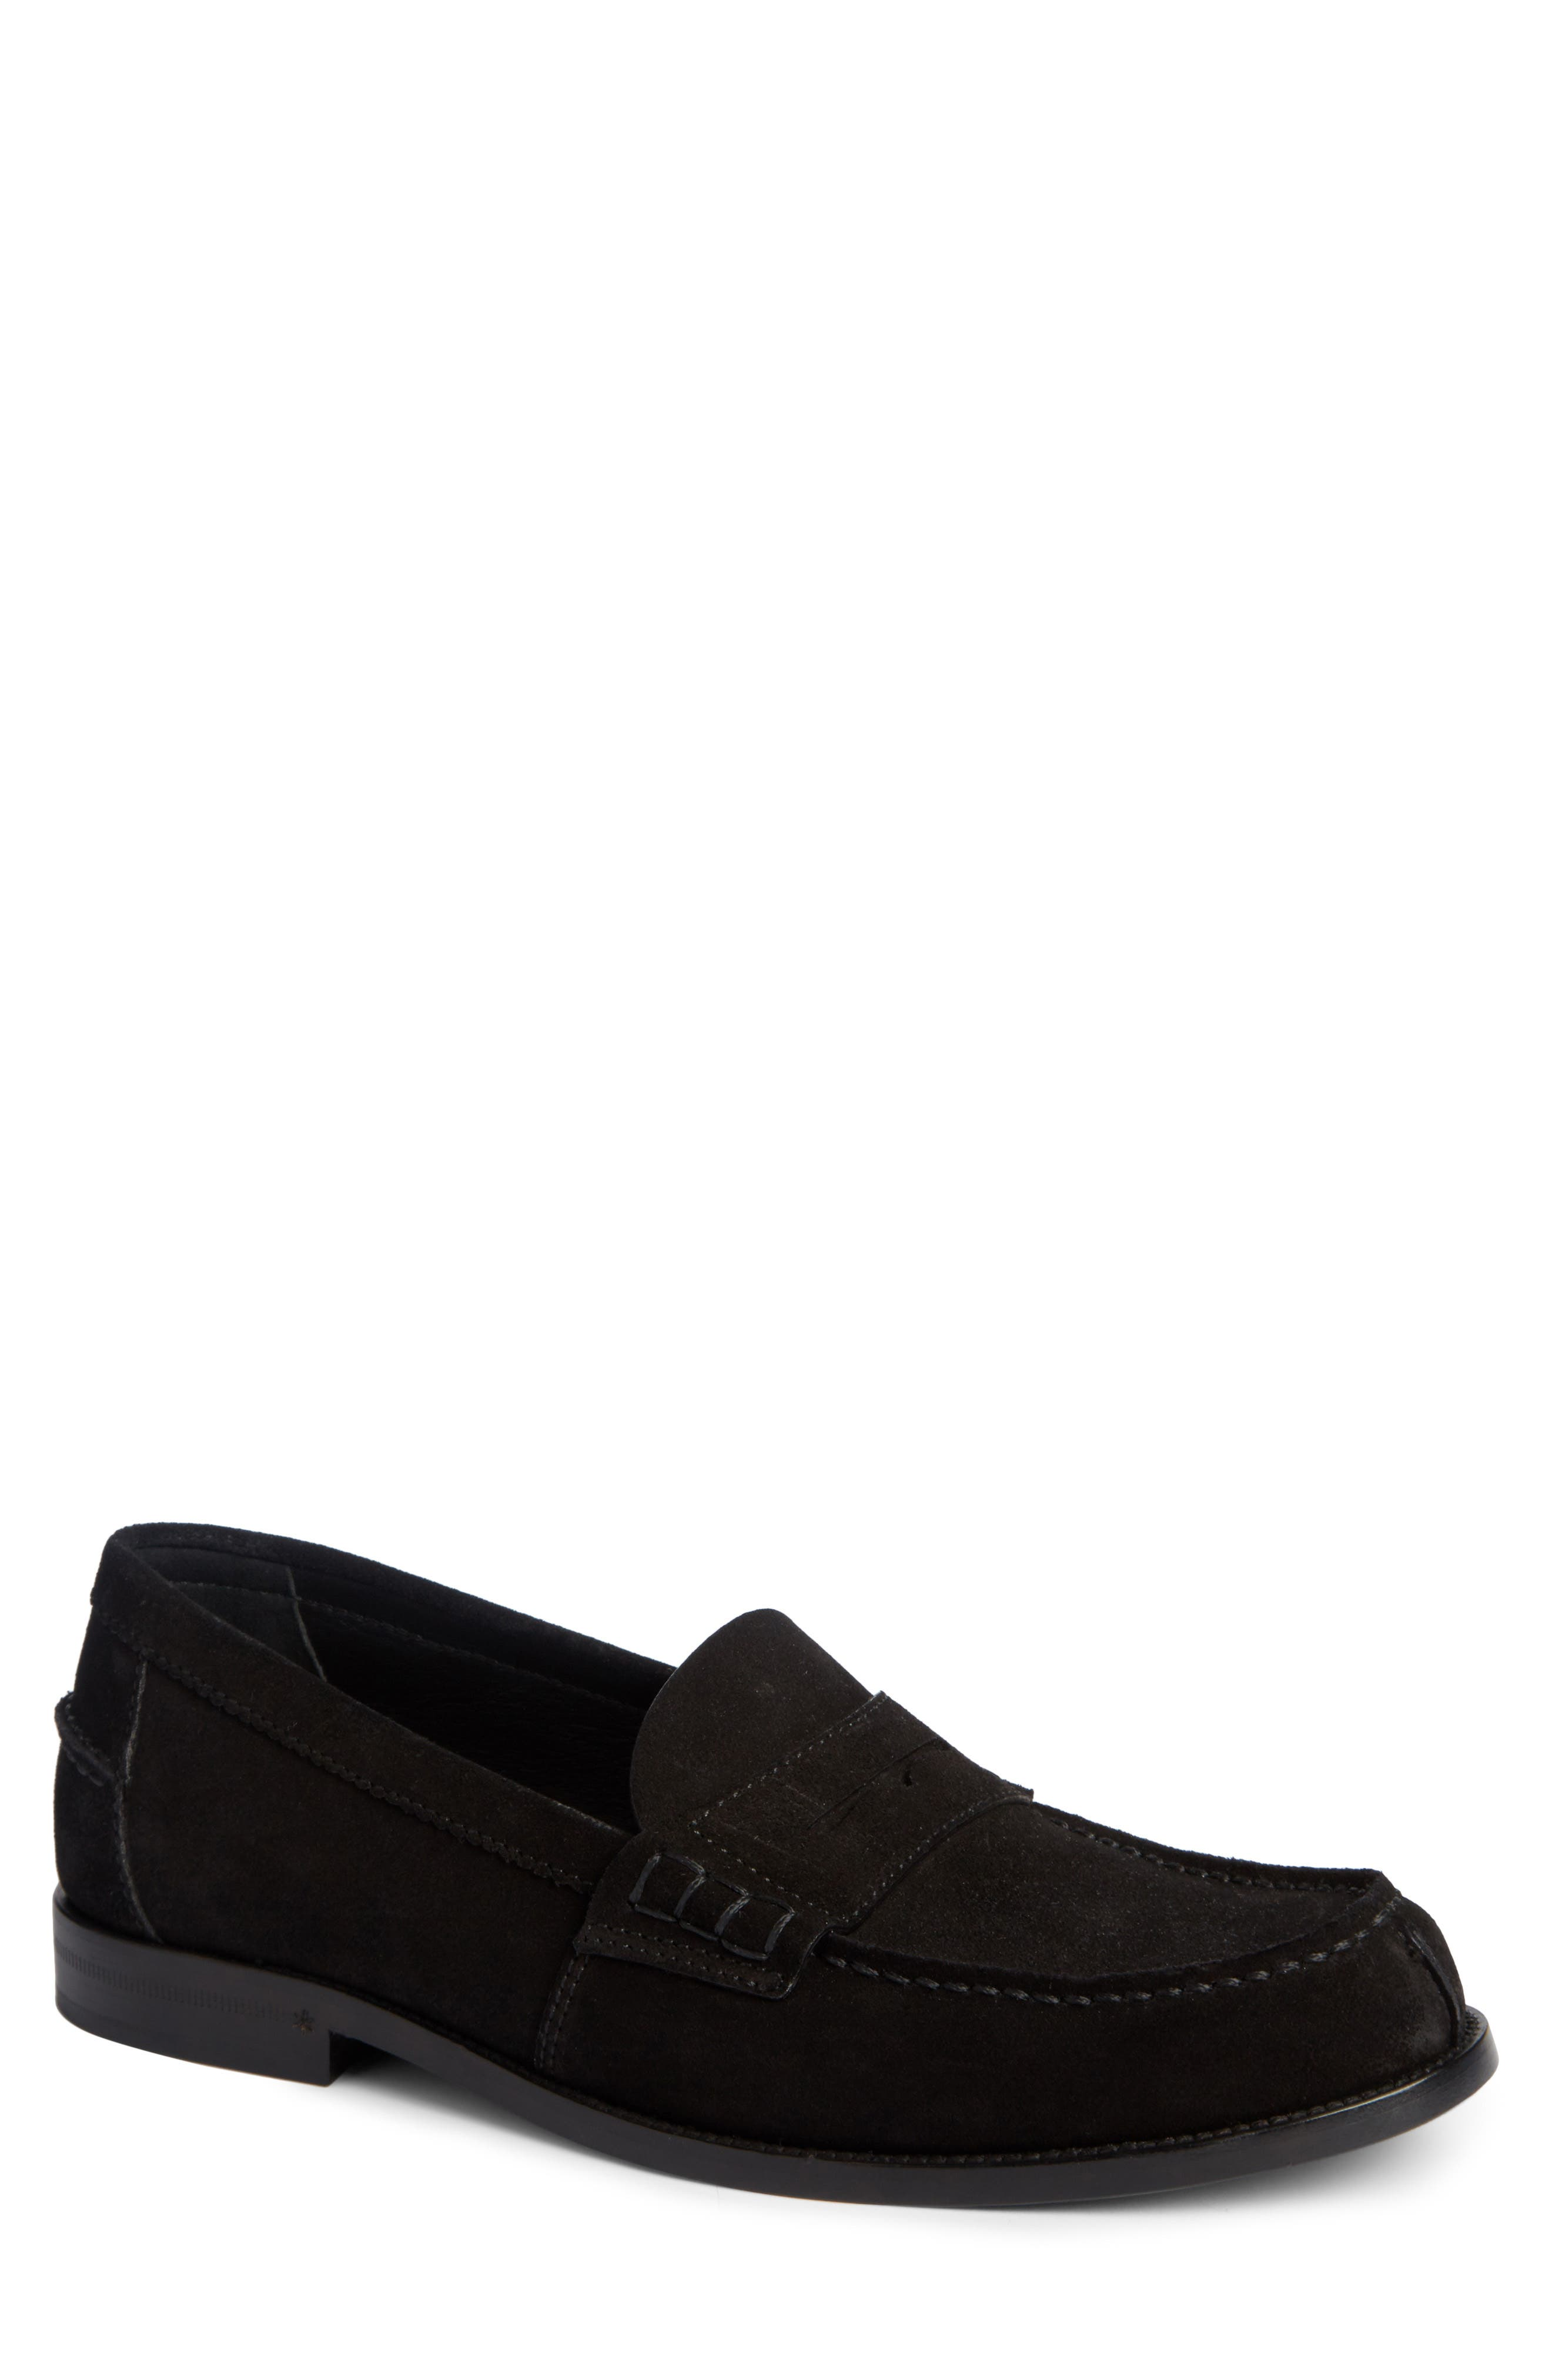 Penny Loafer,                         Main,                         color, Black Suede